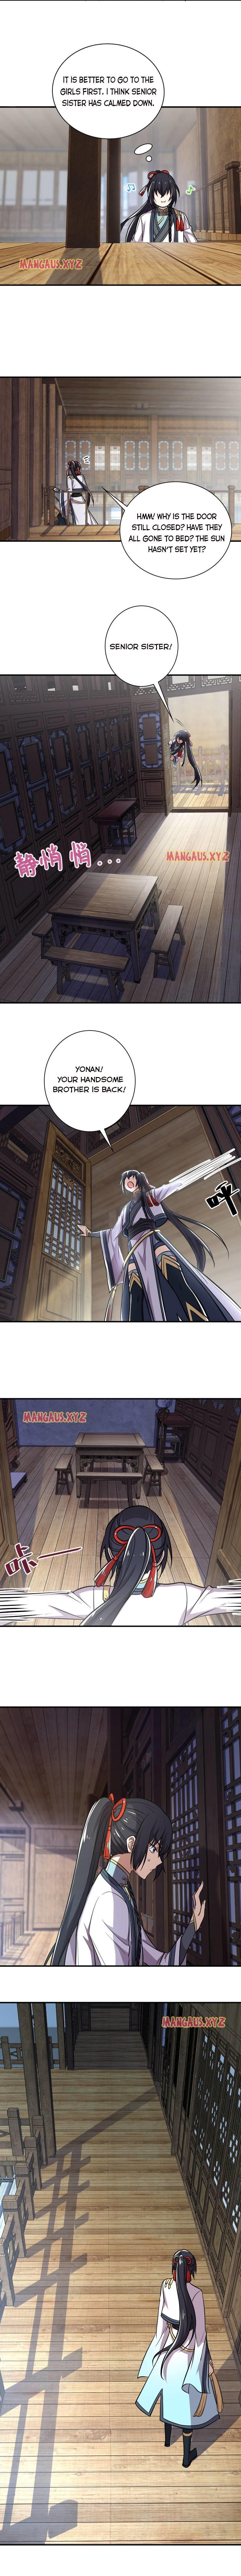 Life Of A War Emperor After Retirement Chapter 30 page 4 - Mangakakalots.com